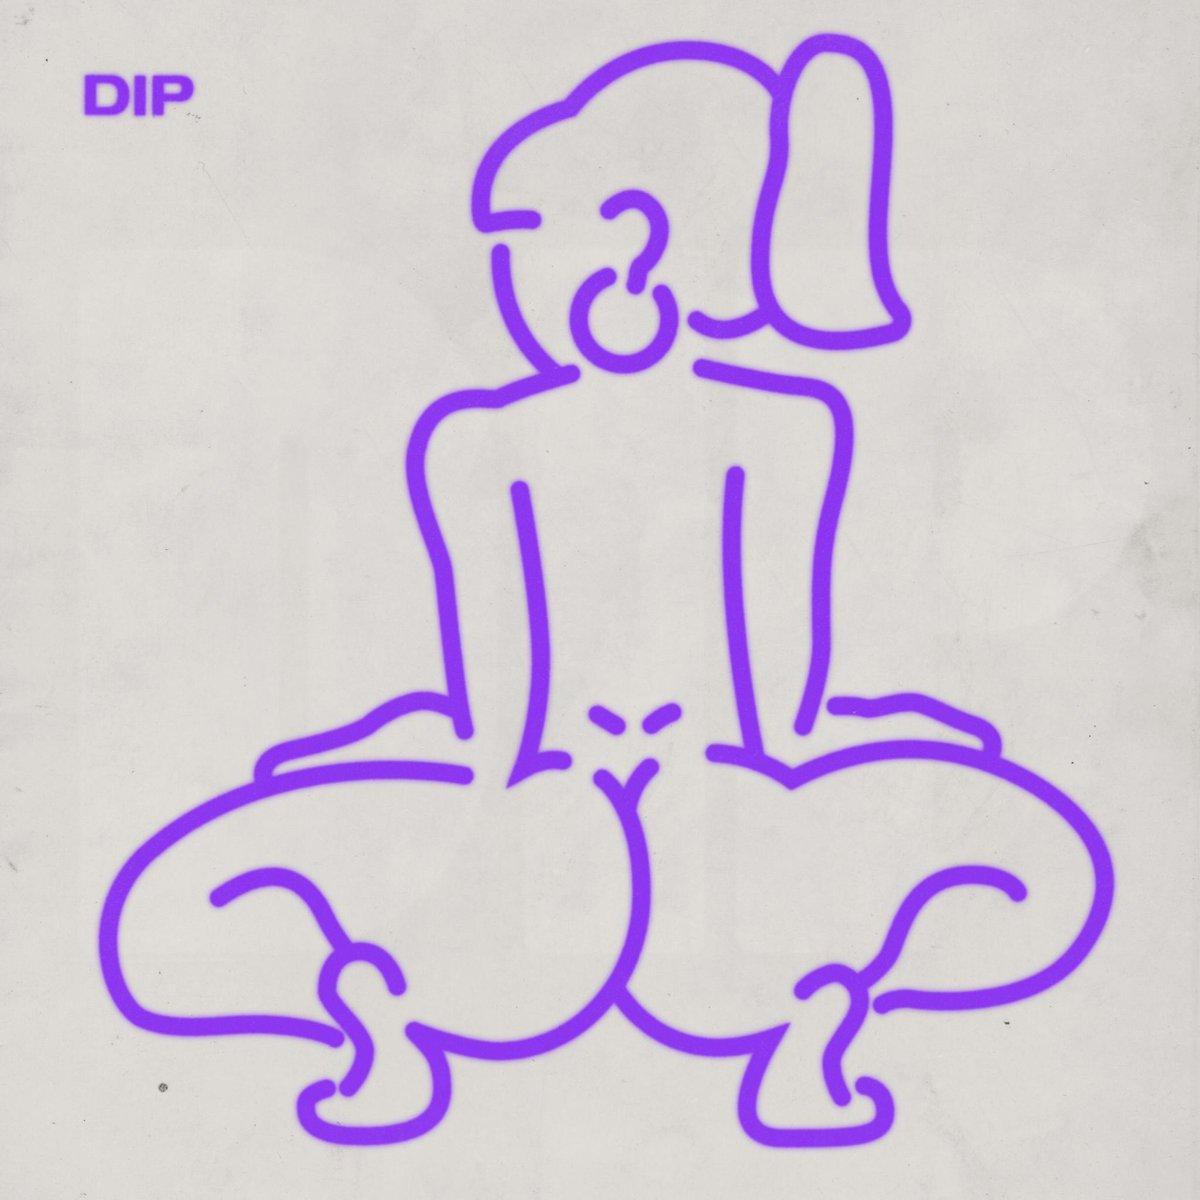 RT @TIDAL: Dropped: #Dip. @NICKIMINAJ x @Tyga x TIDAL's THORO playlist: https://t.co/55f2OiUa9I https://t.co/q9RO73J0rg